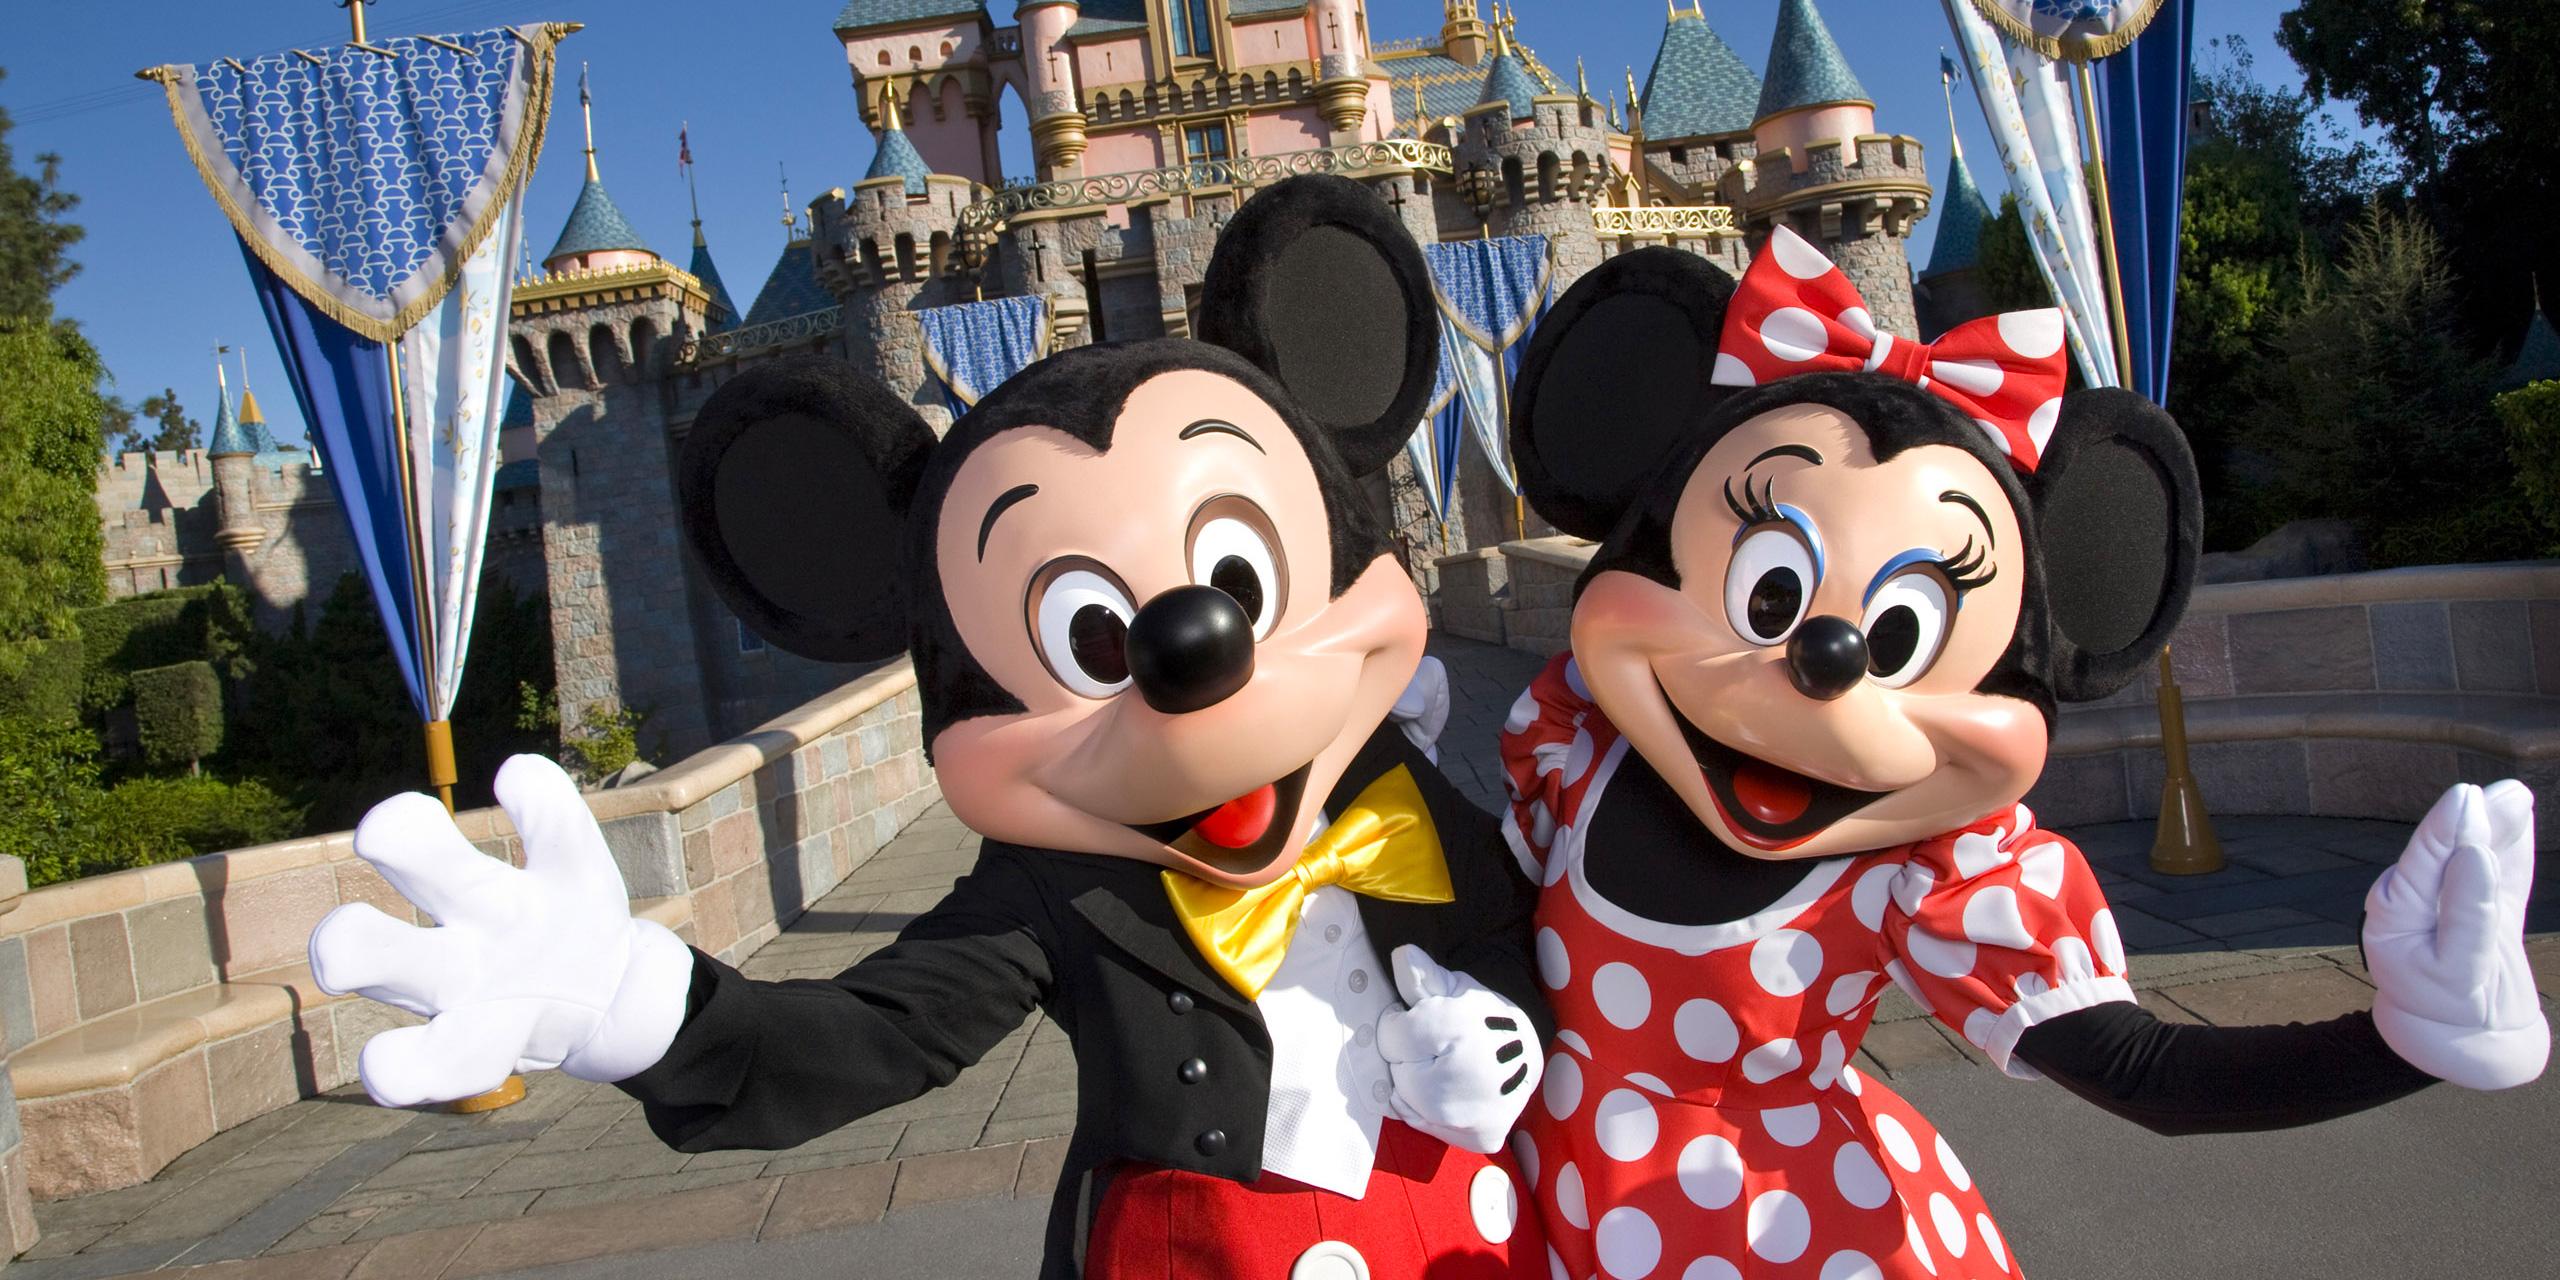 Mickey and Minnie mouse; Courtesy of Walt Disney World